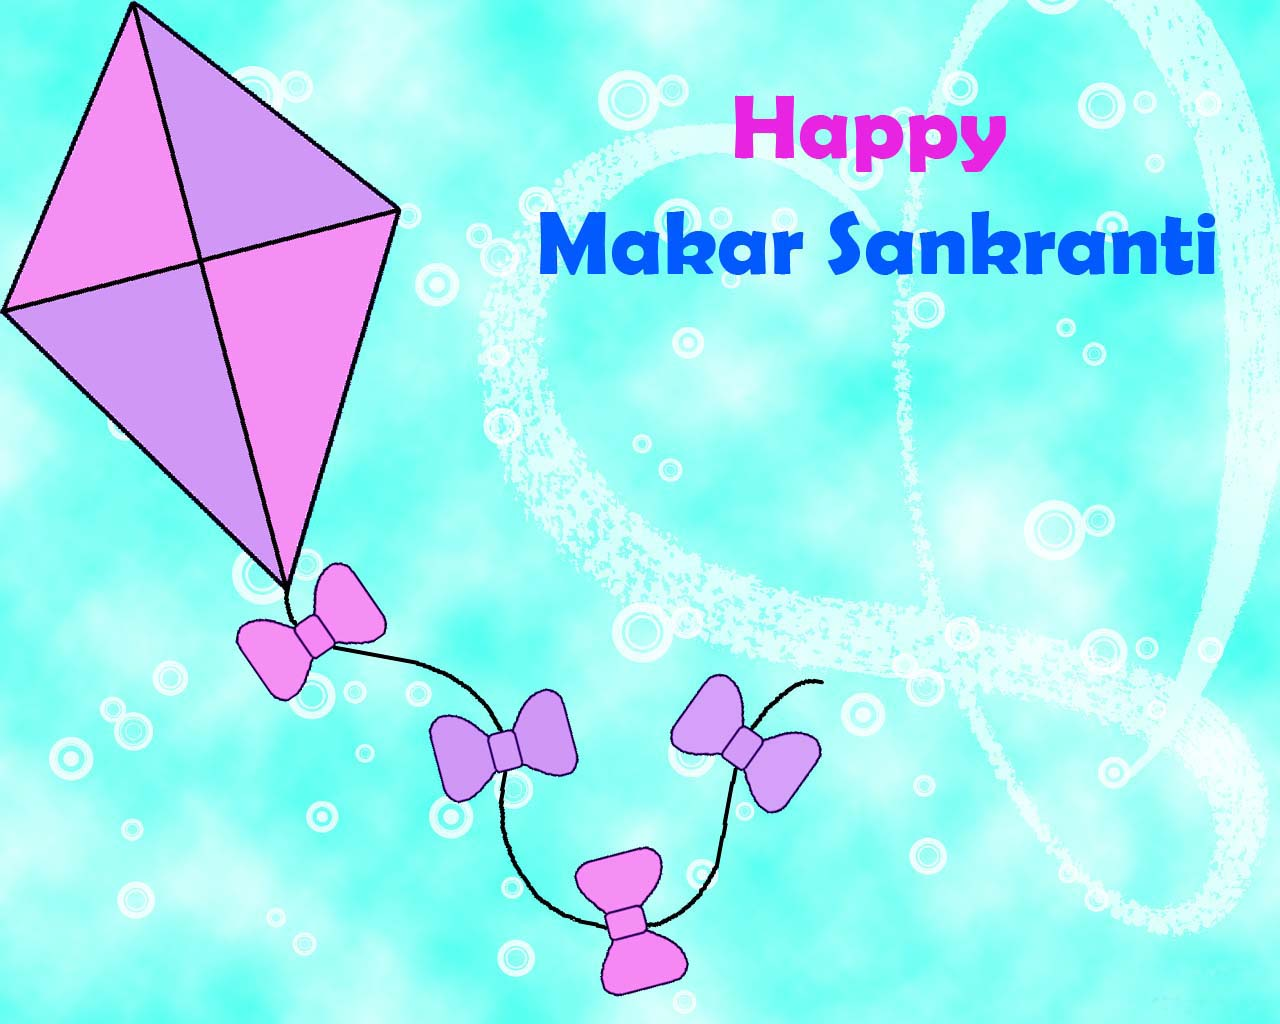 Hd Wallpaper Graphic Happy Makar Sankranti And Happy Uttarayan